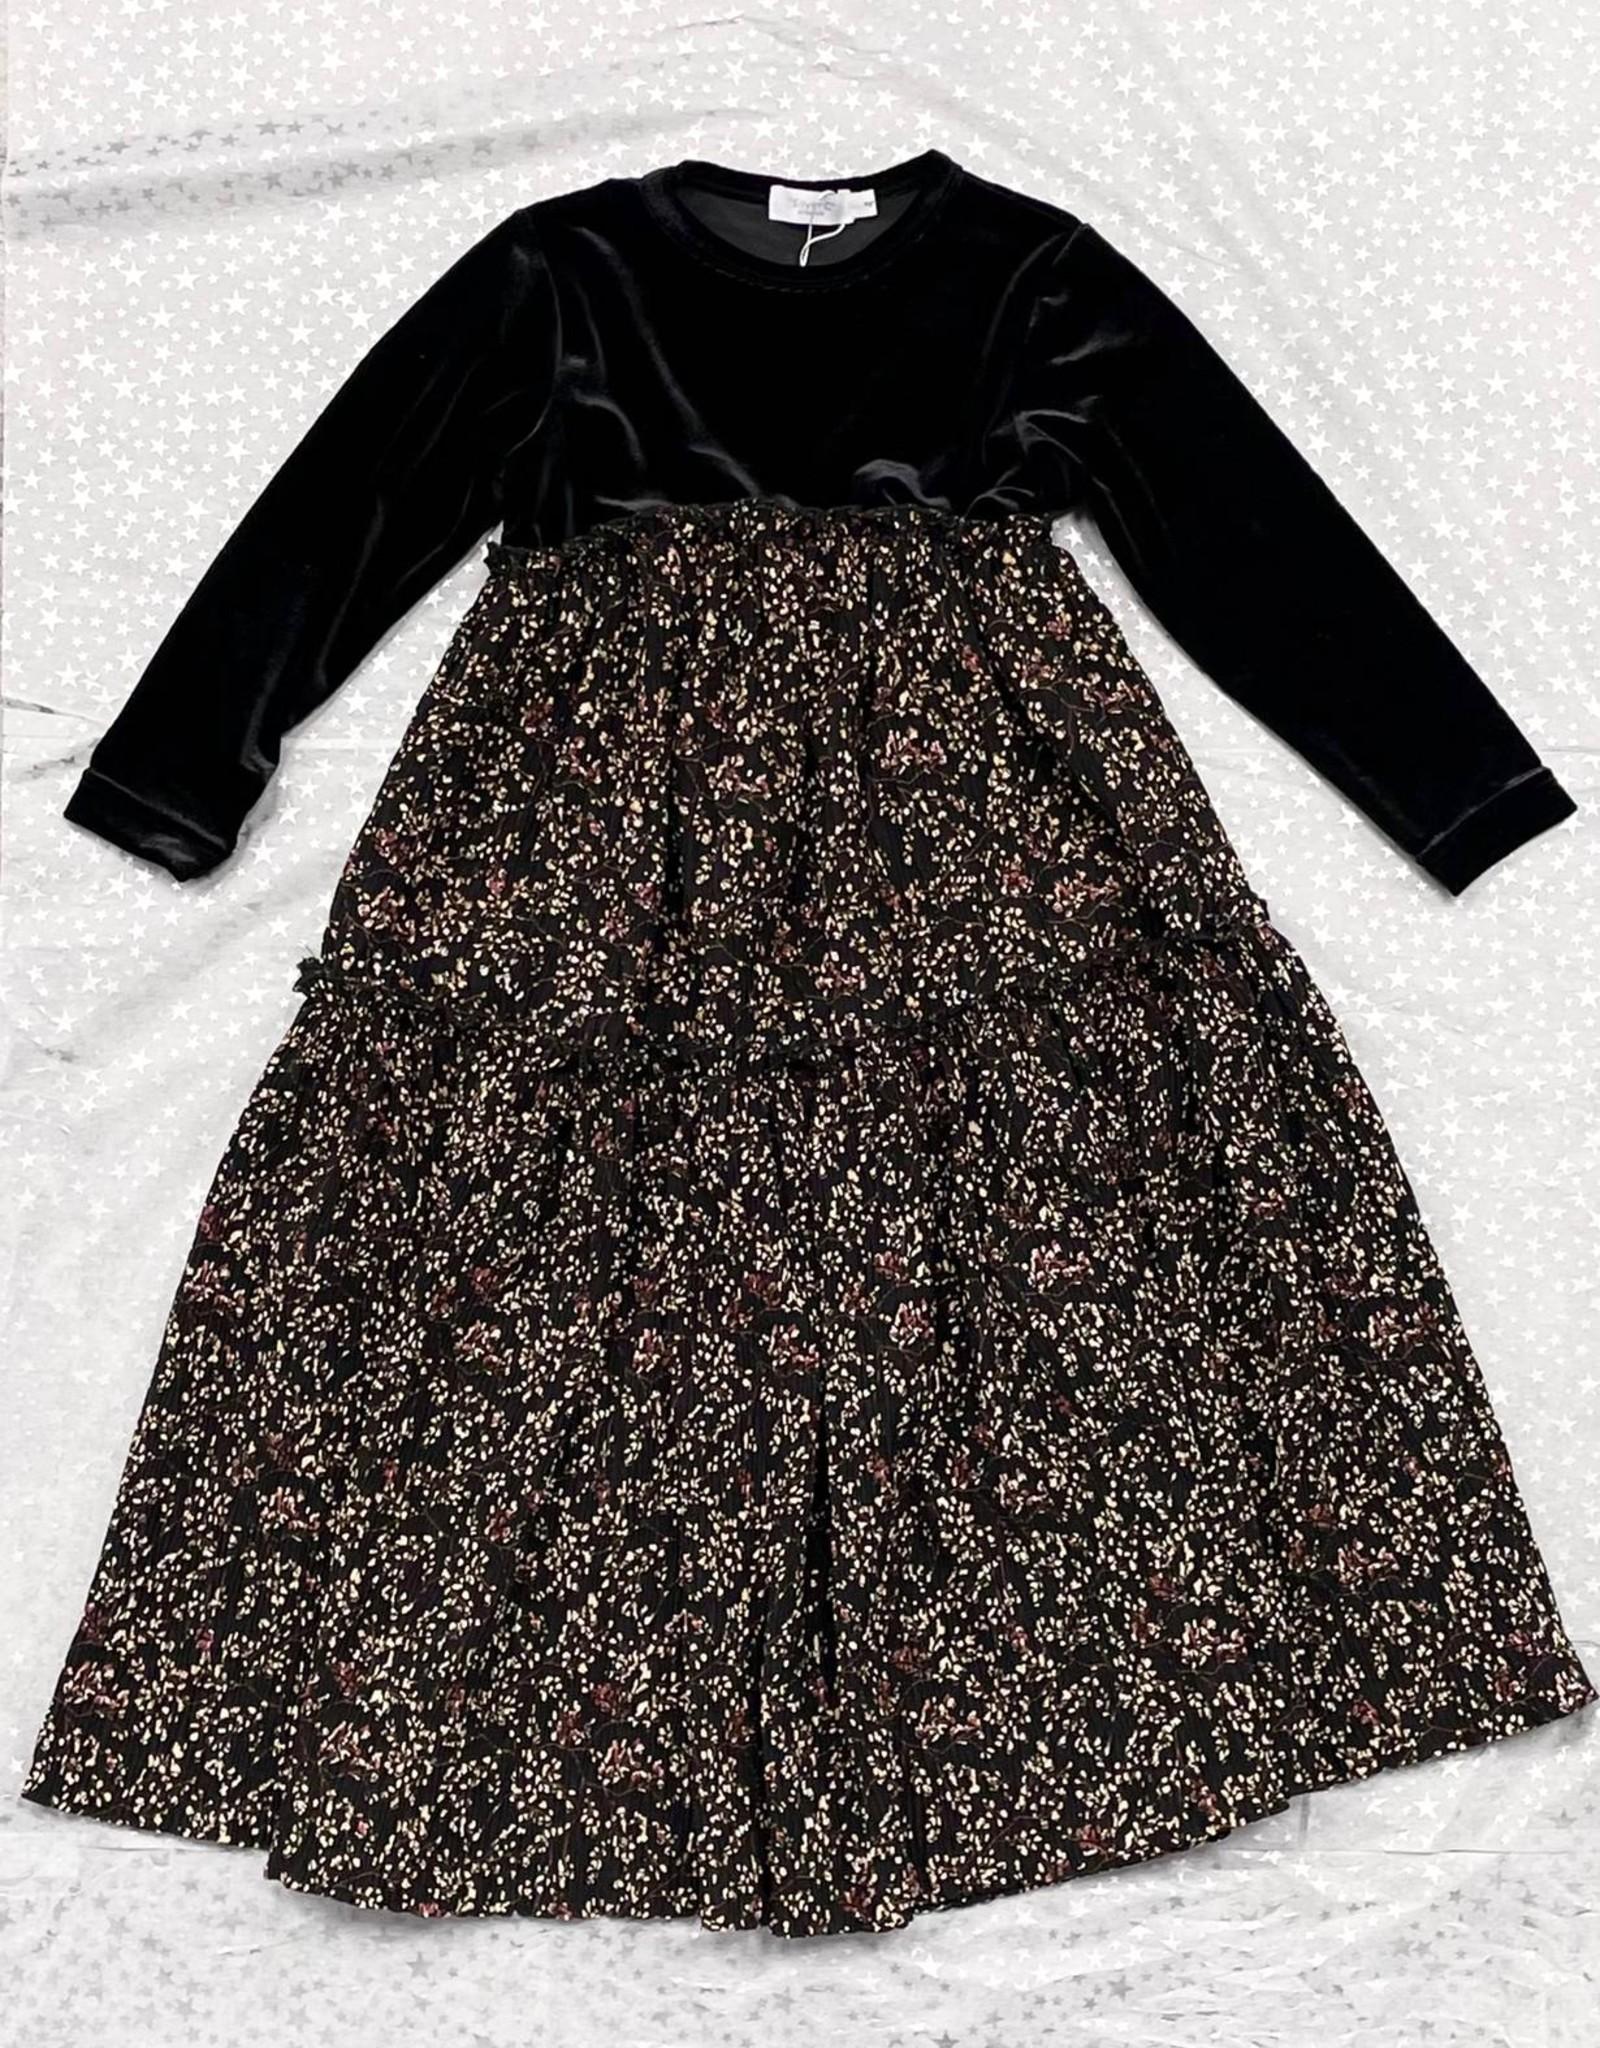 SilverC SilverC Autumn Sparkle Tiered Robe with Empire Waist and Velvet Top